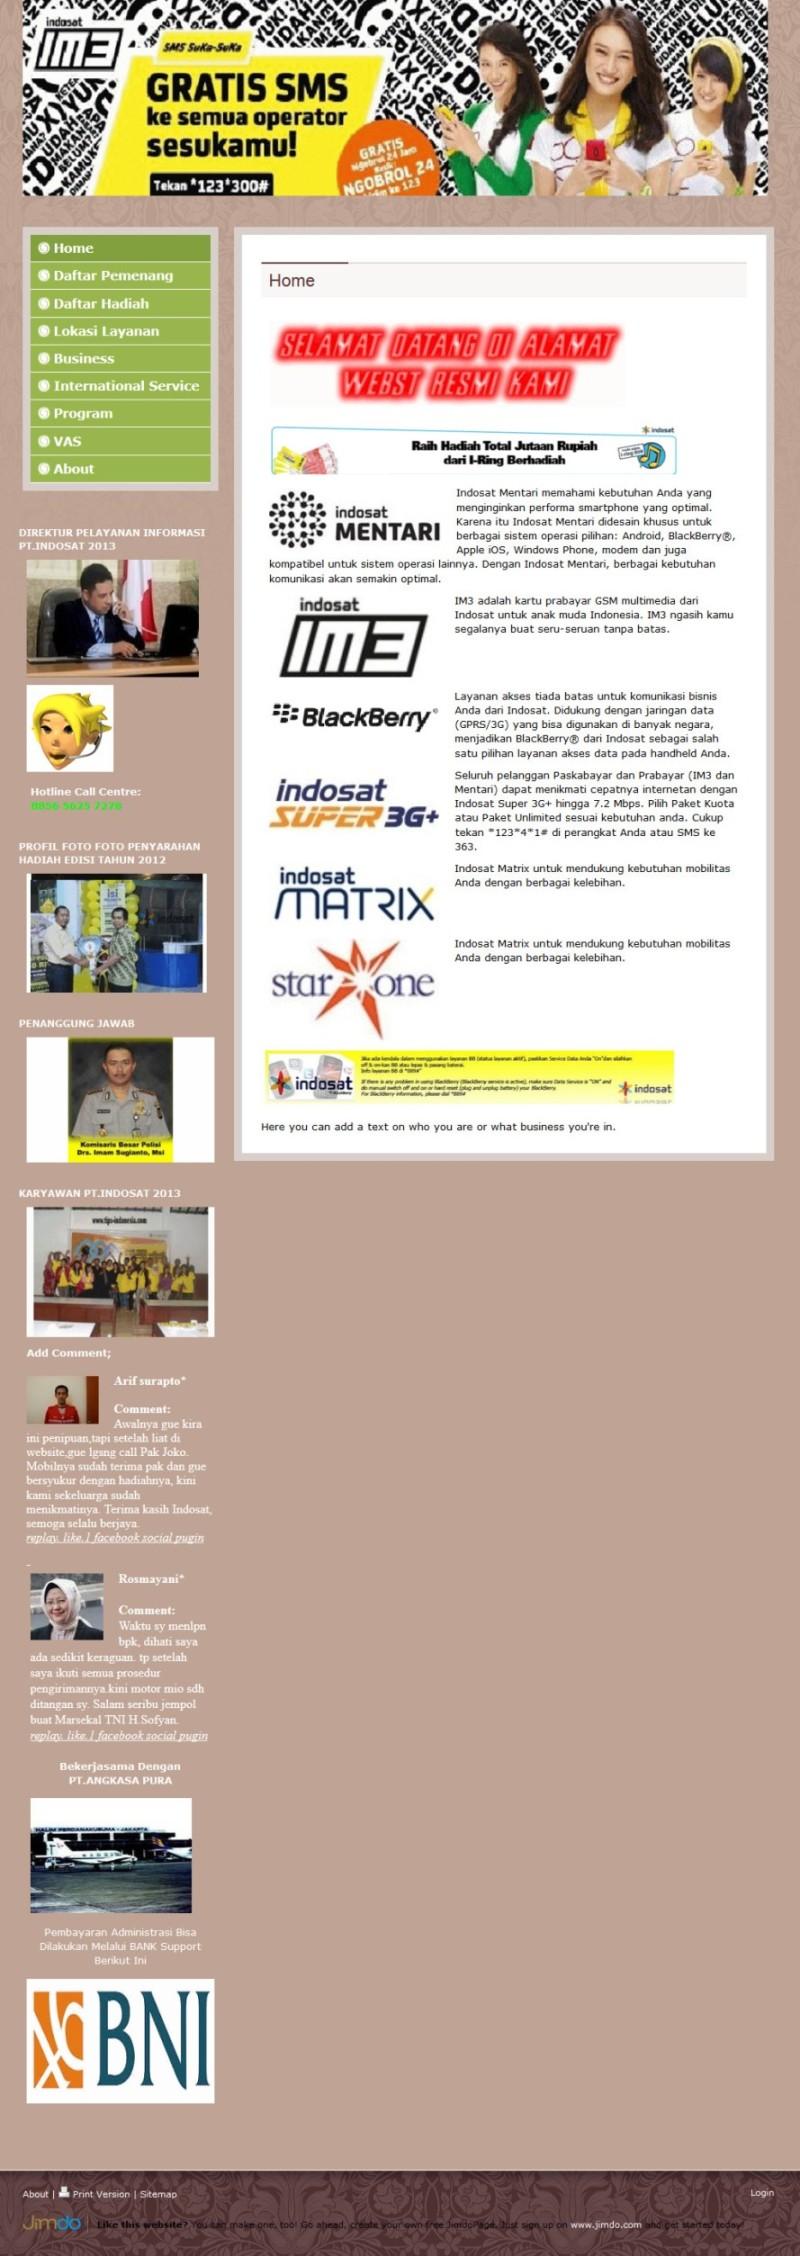 Modus Penipuan Indosat Atas Nama via Website